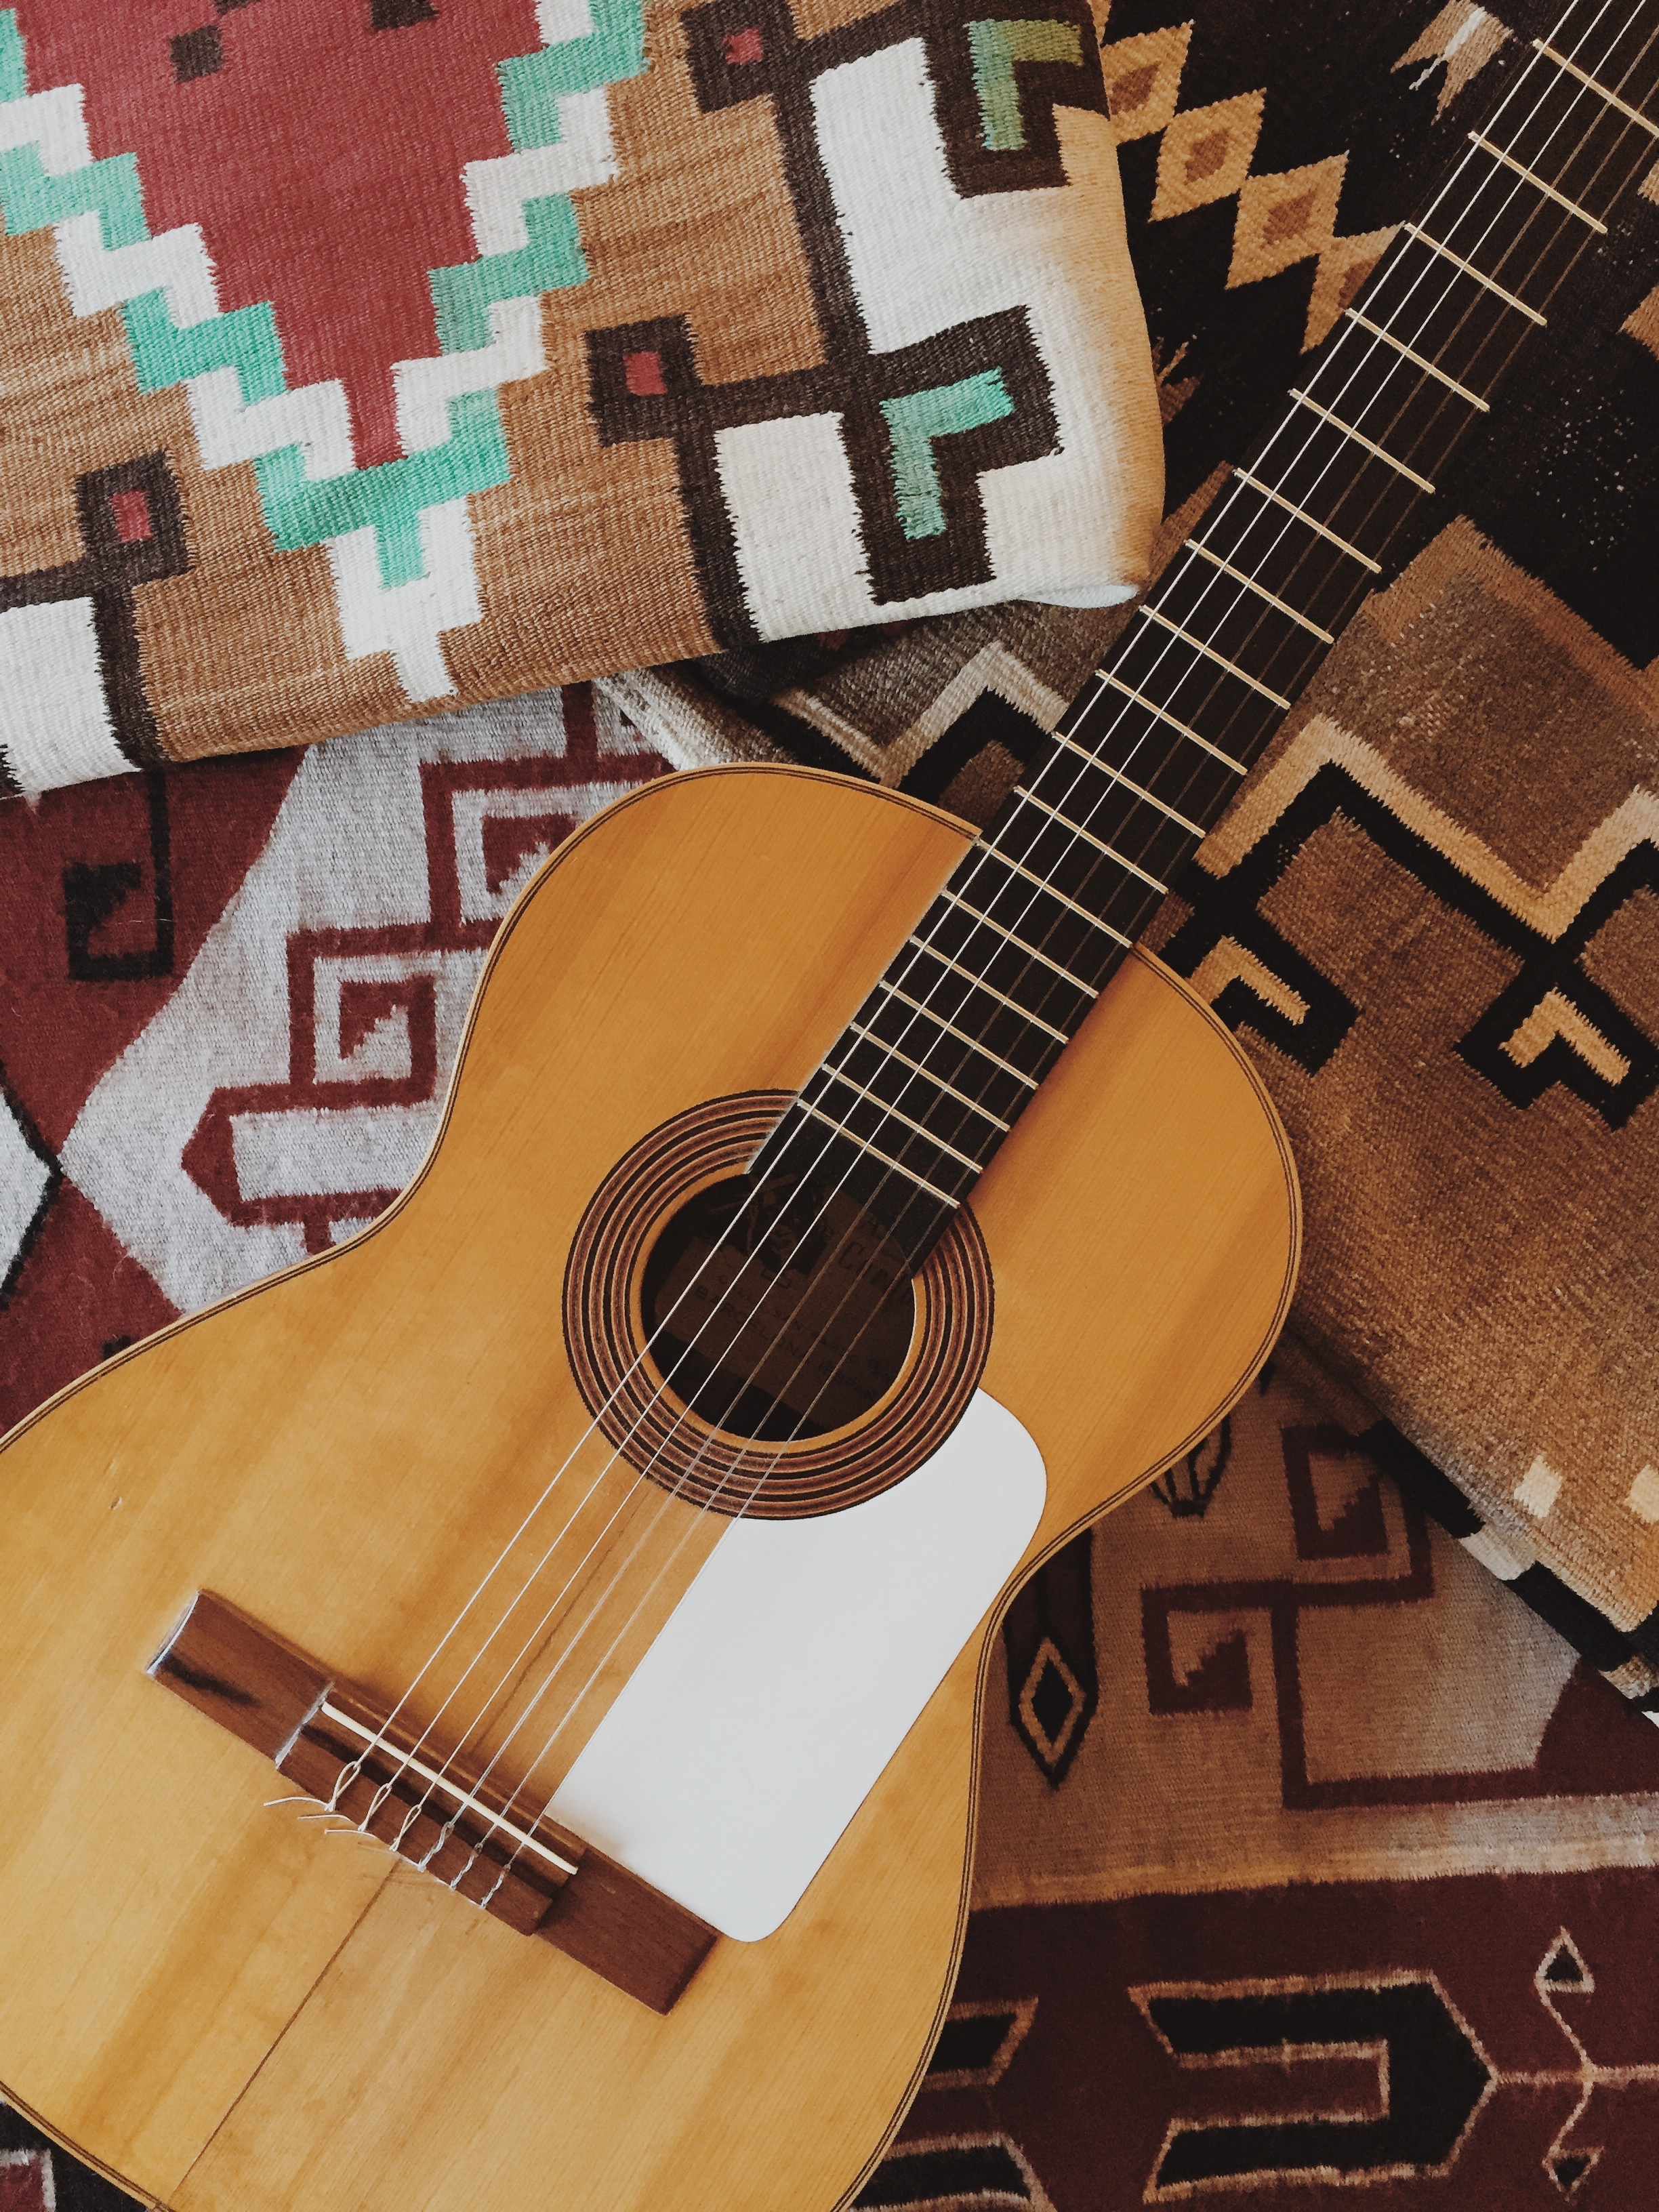 Guitar, Instrument, Music, Passion, Profession, HQ Photo